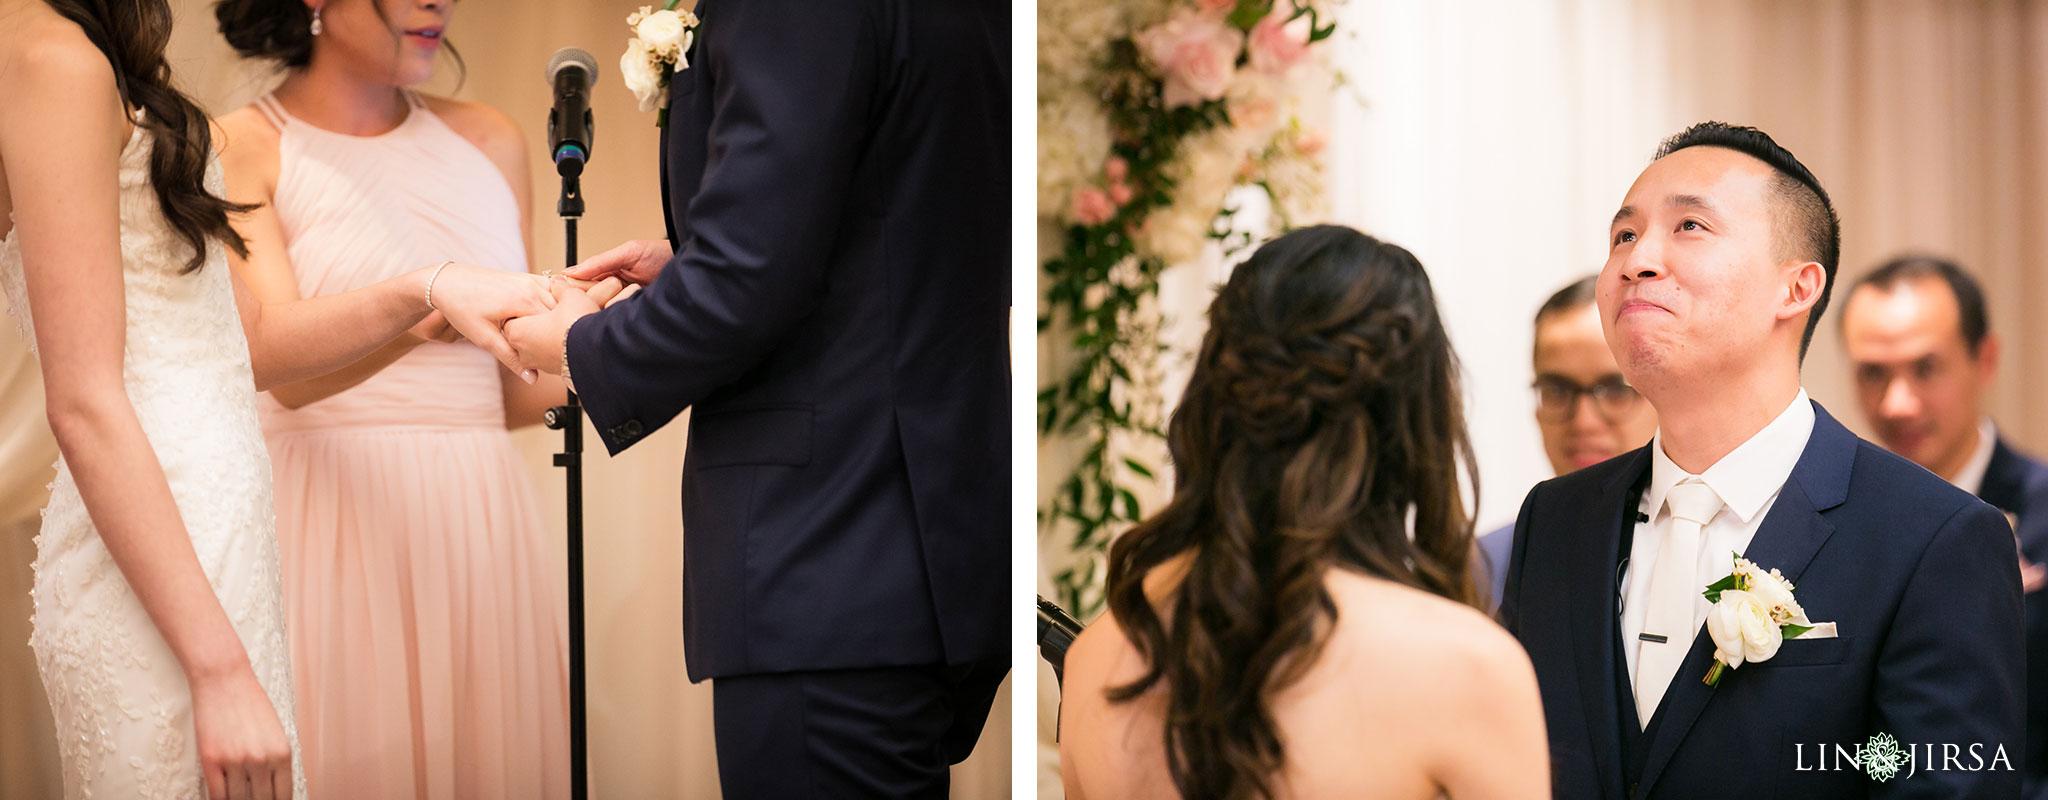 28 hilton costa mesa wedding ceremony photography